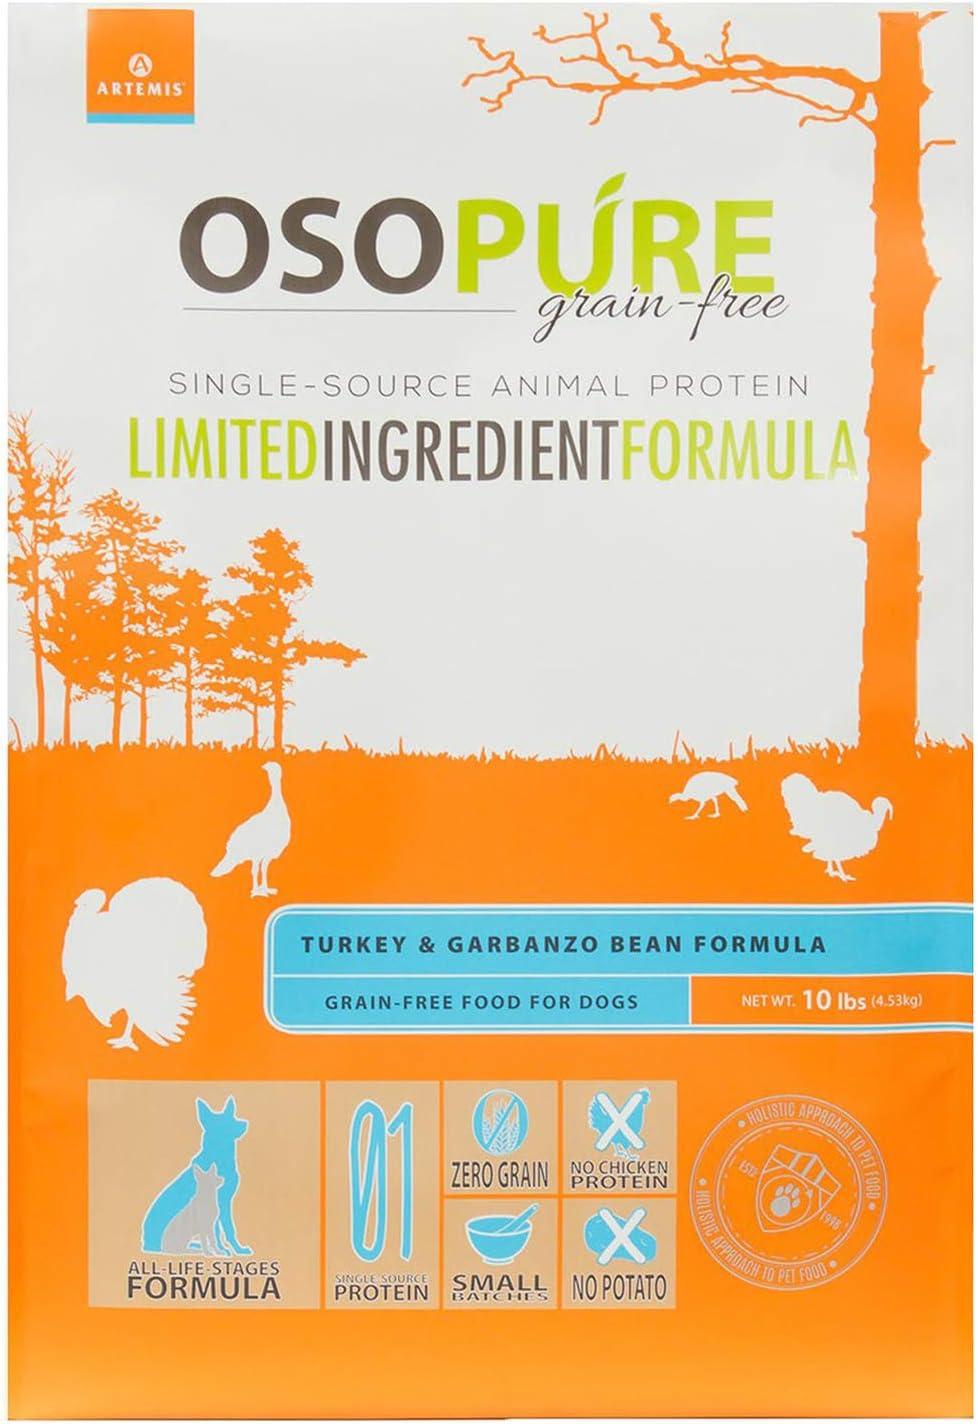 Direct store Sale SALE% OFF Artemis OSOPURE Grain Free Turkey Garbanzo Dog Food Dry Bean